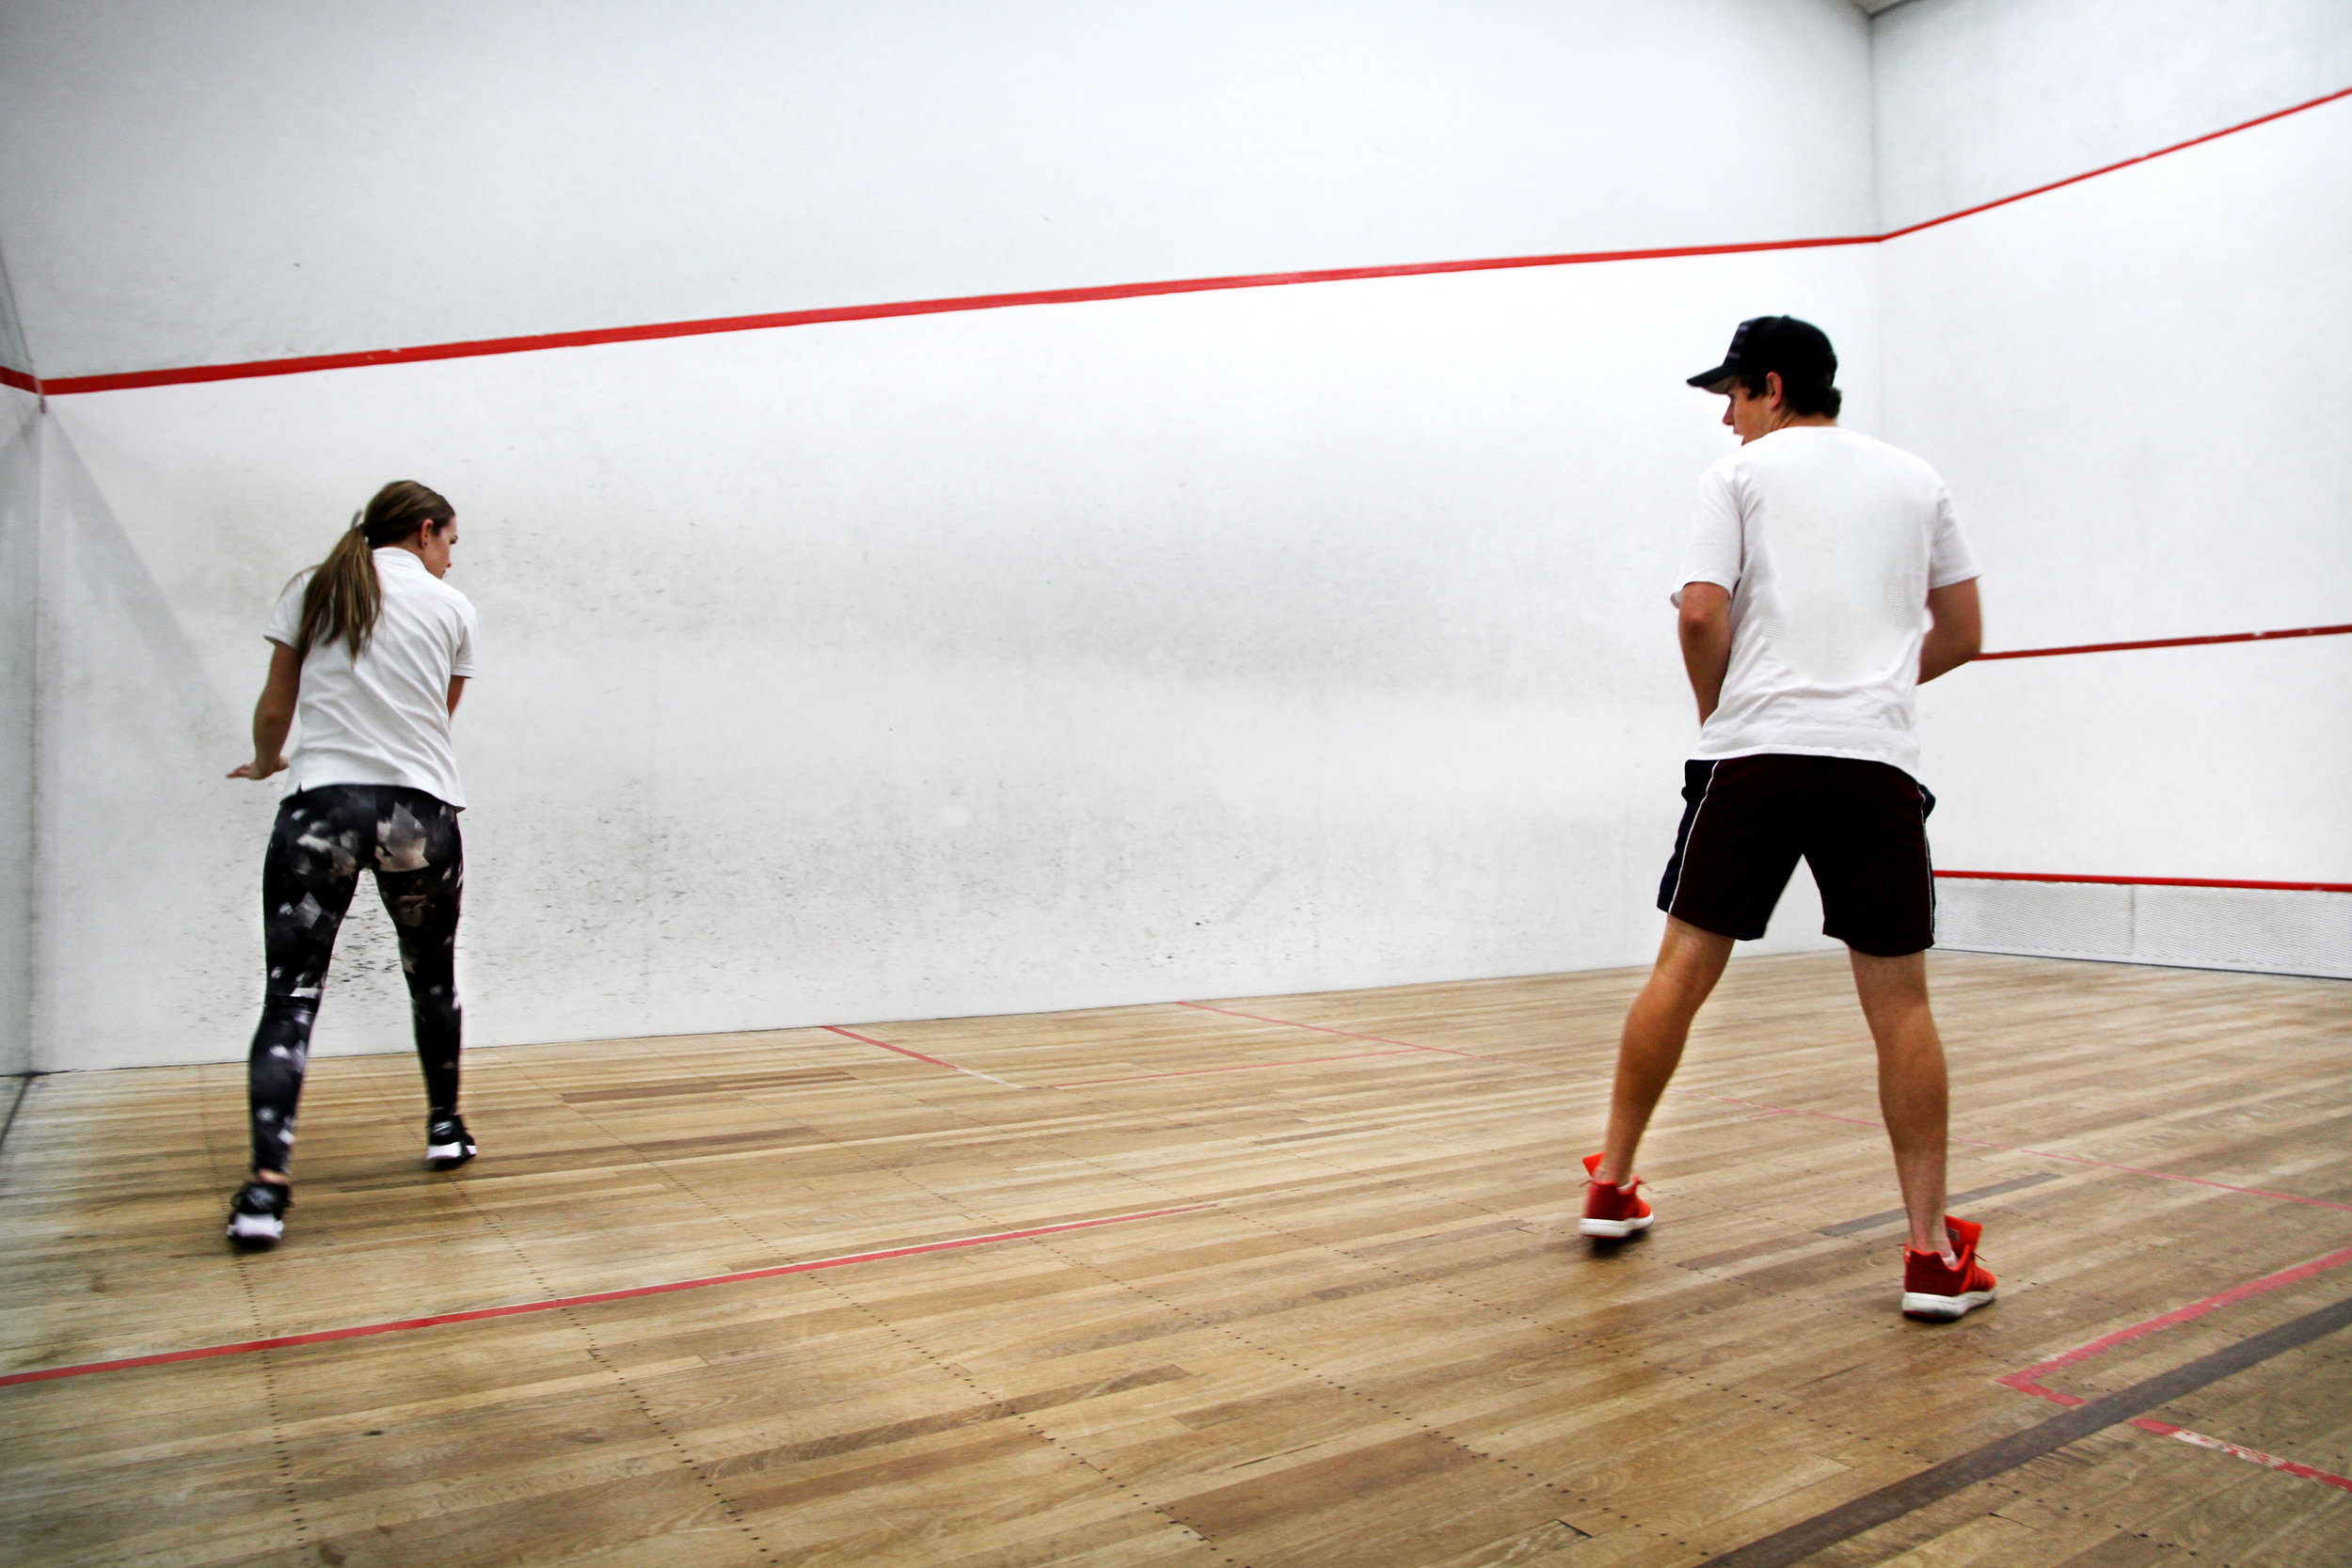 Squash Courts - 7 Squash Courts